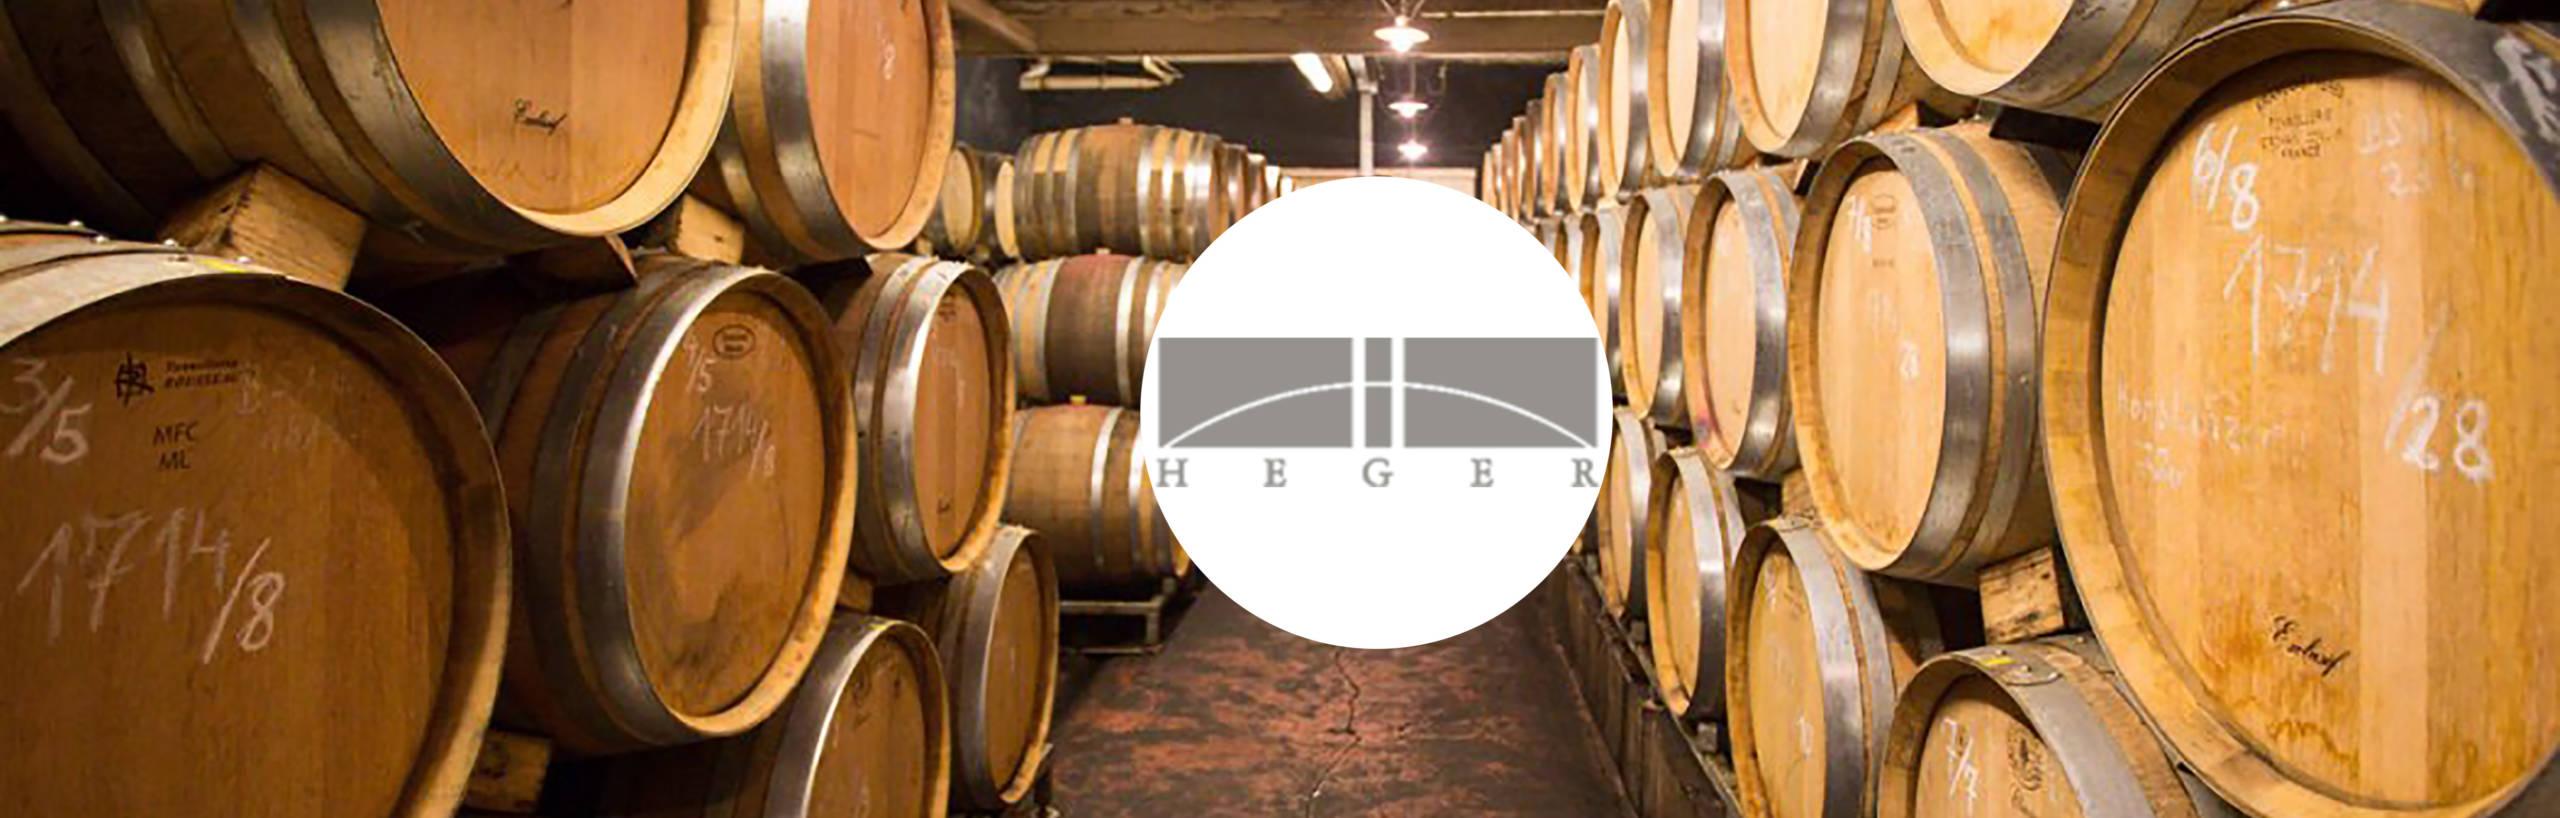 Weingut Heger Castello del Gusto